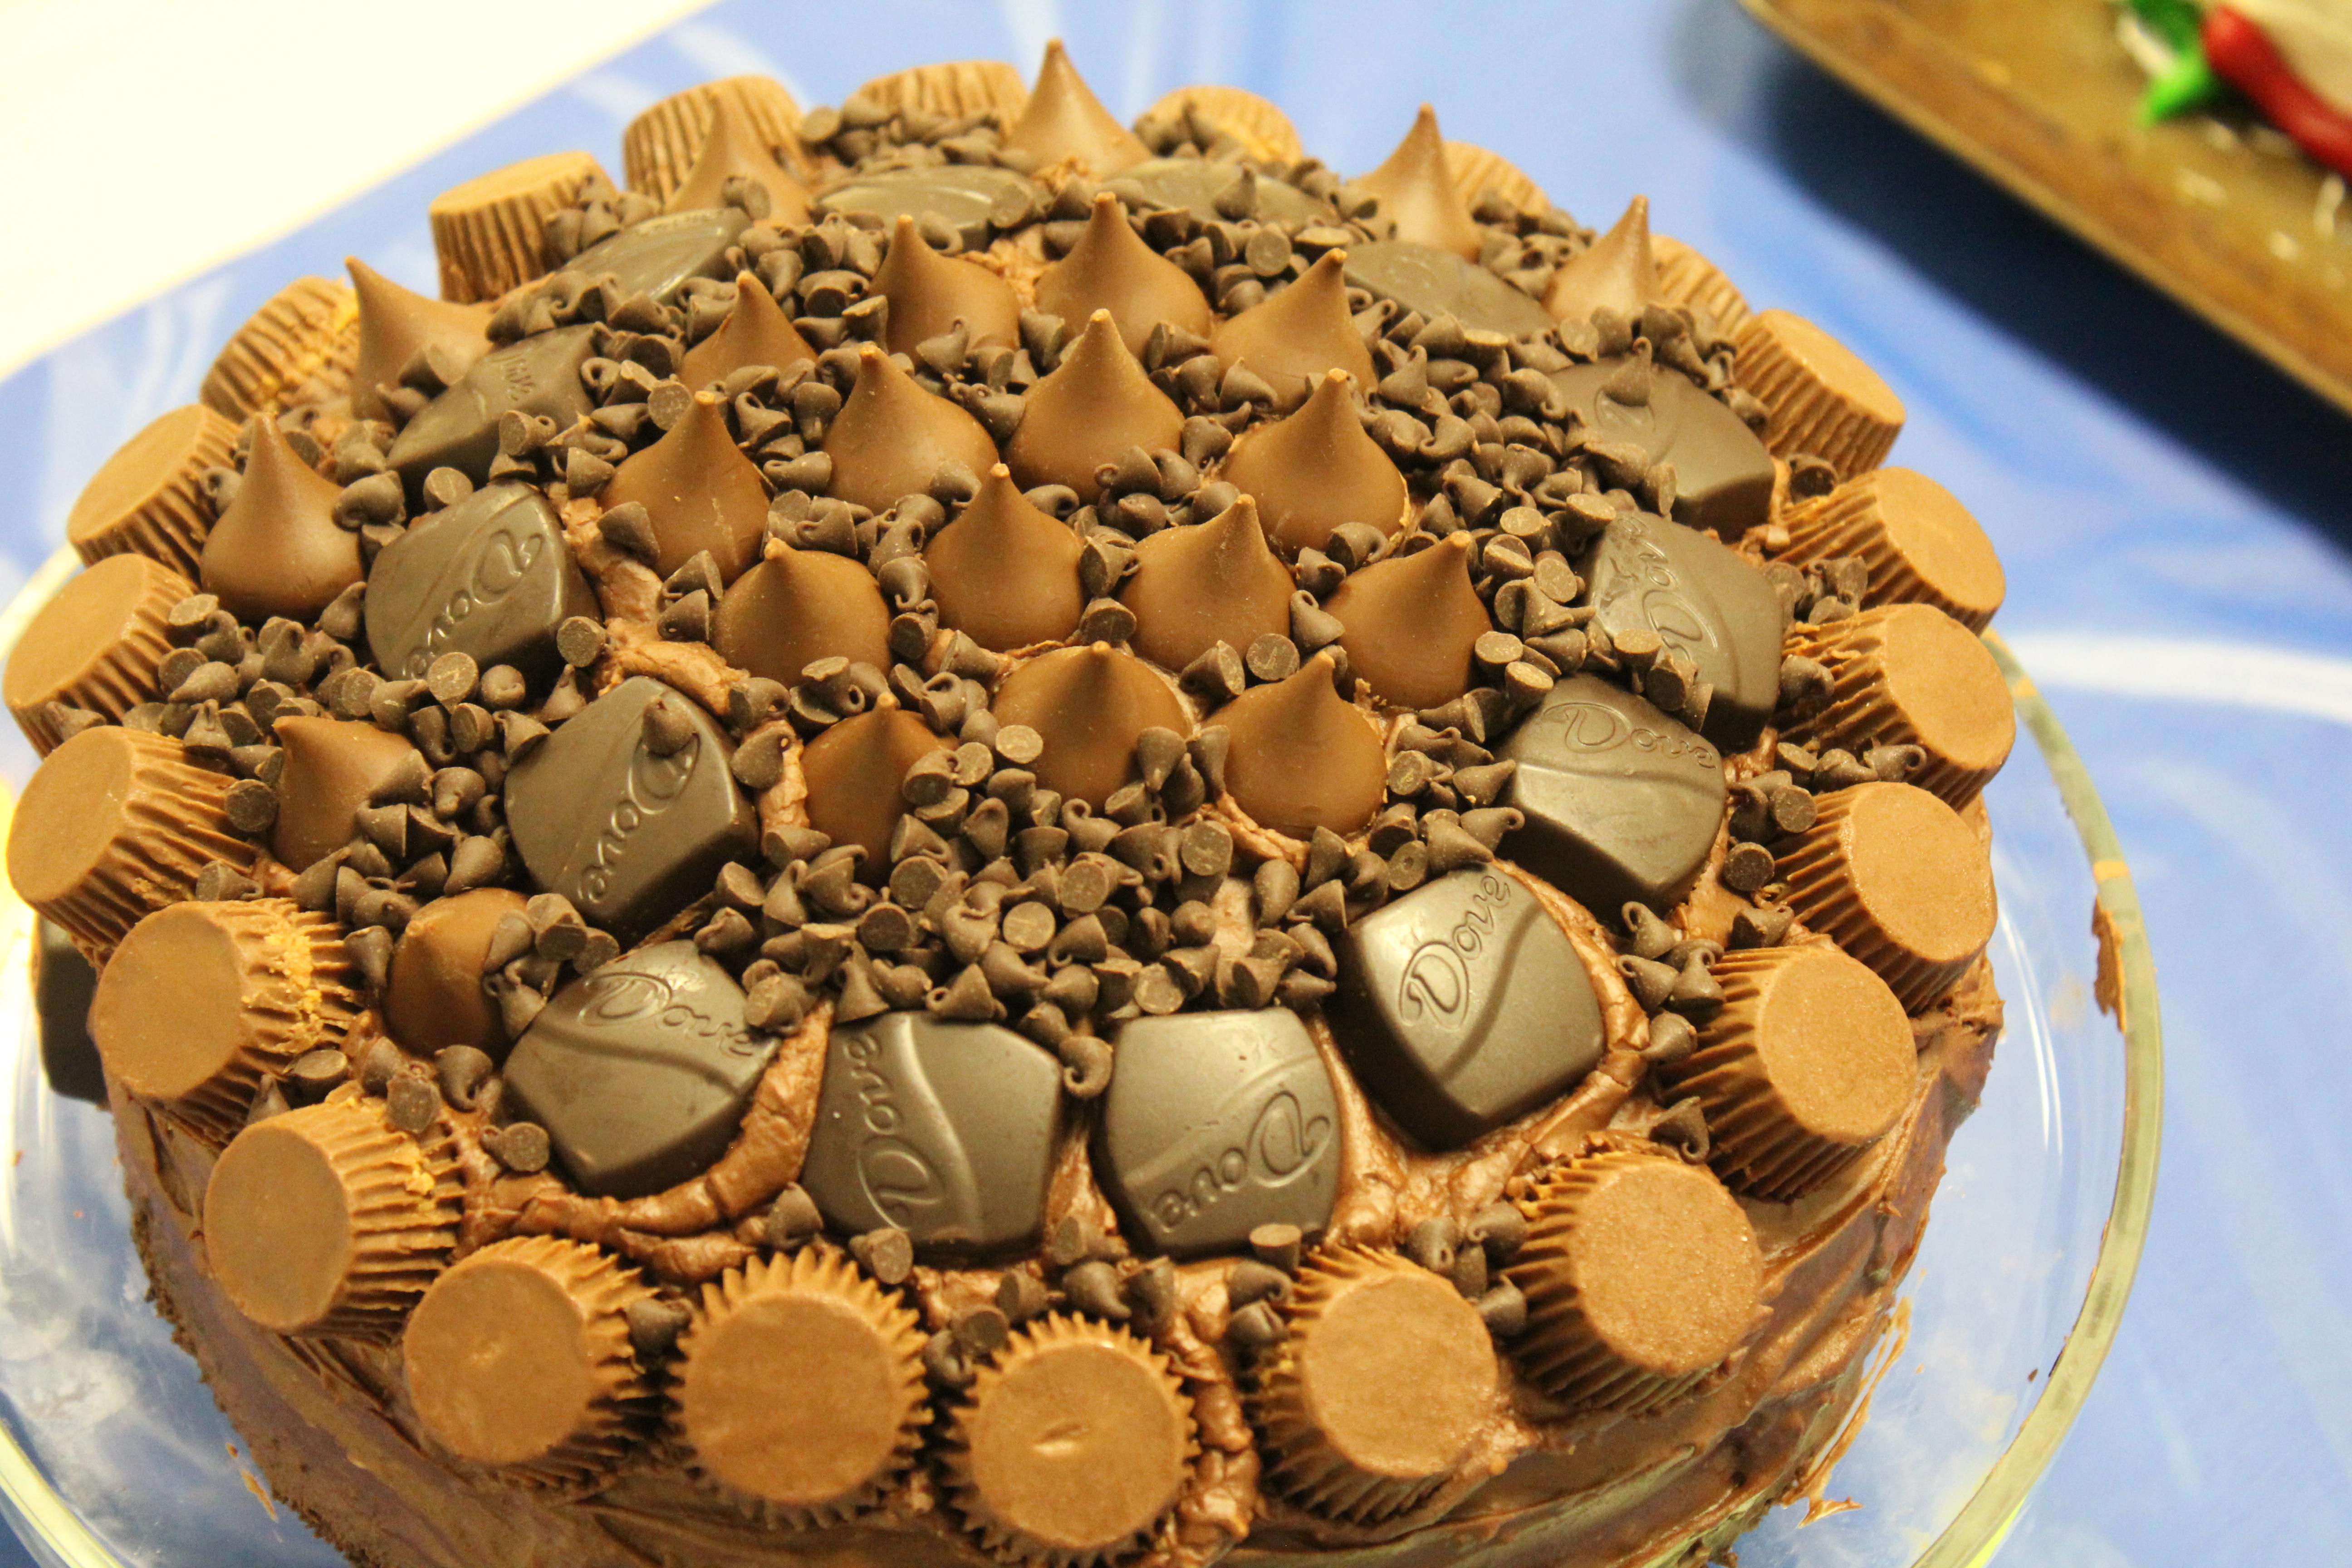 Gluten Free Chocolate Explosion Cake A Winning Recipe